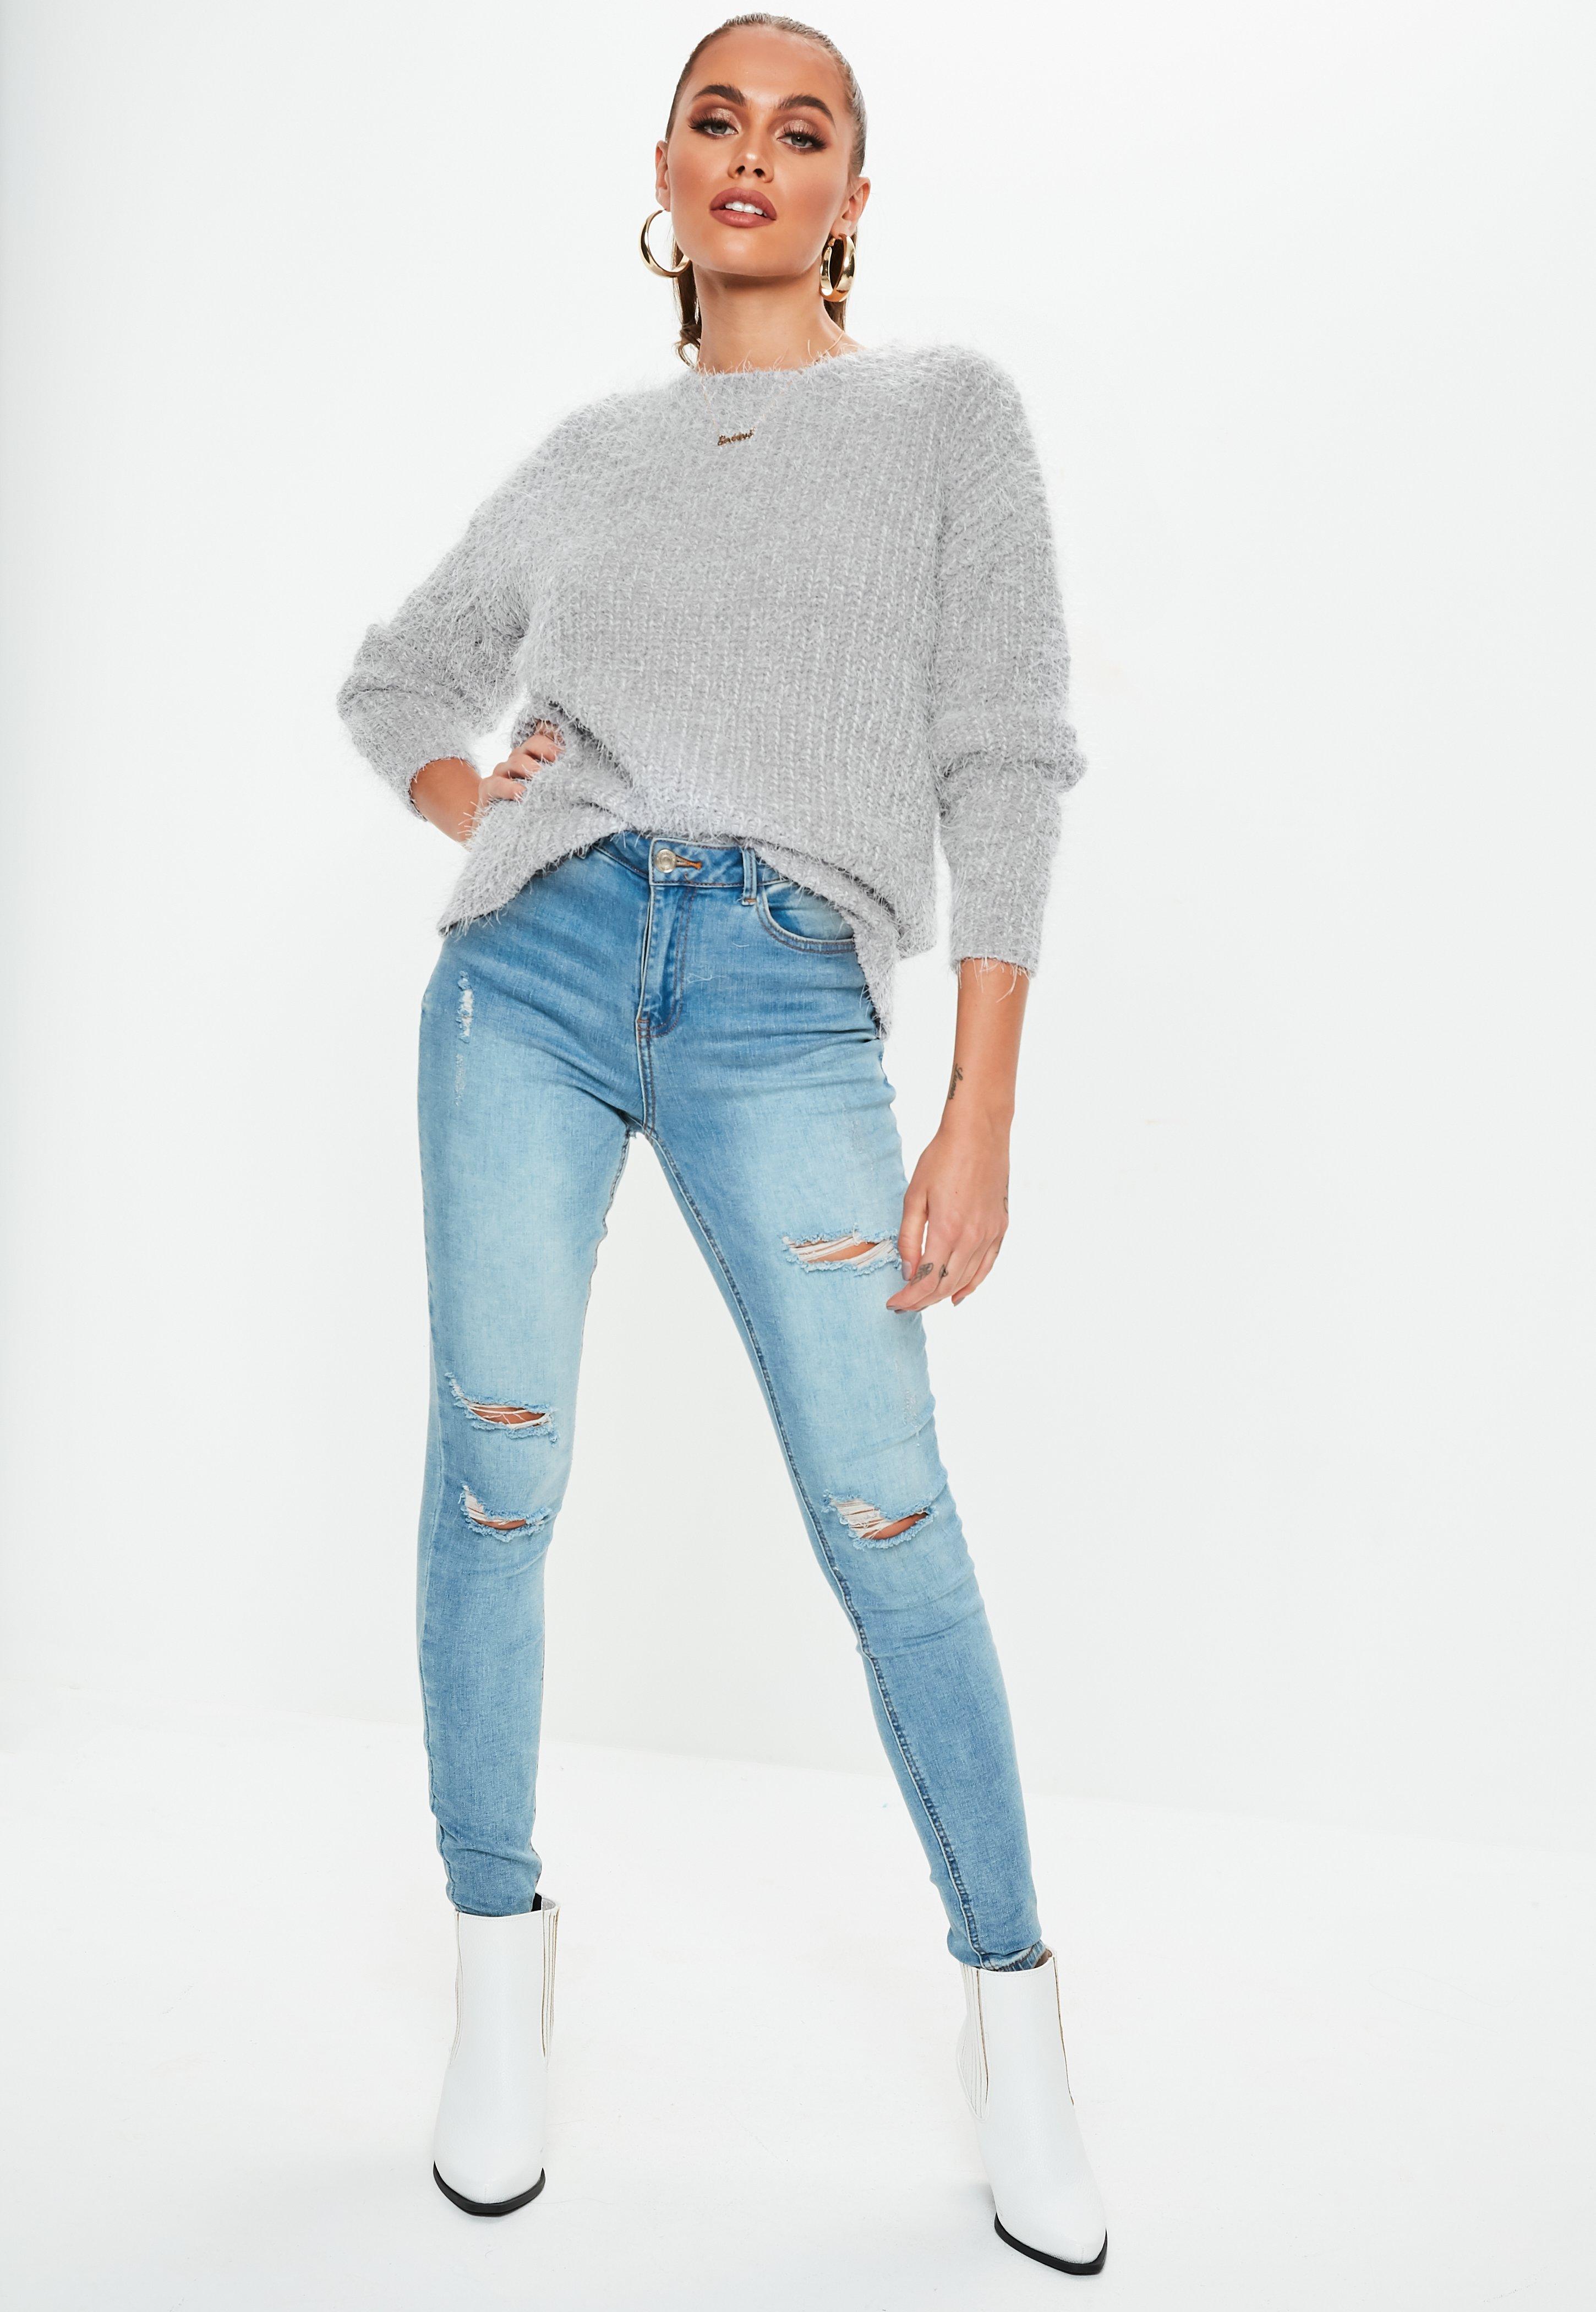 82c65507b67 Sale - Cheap Clothes for Women Online - Missguided Australia